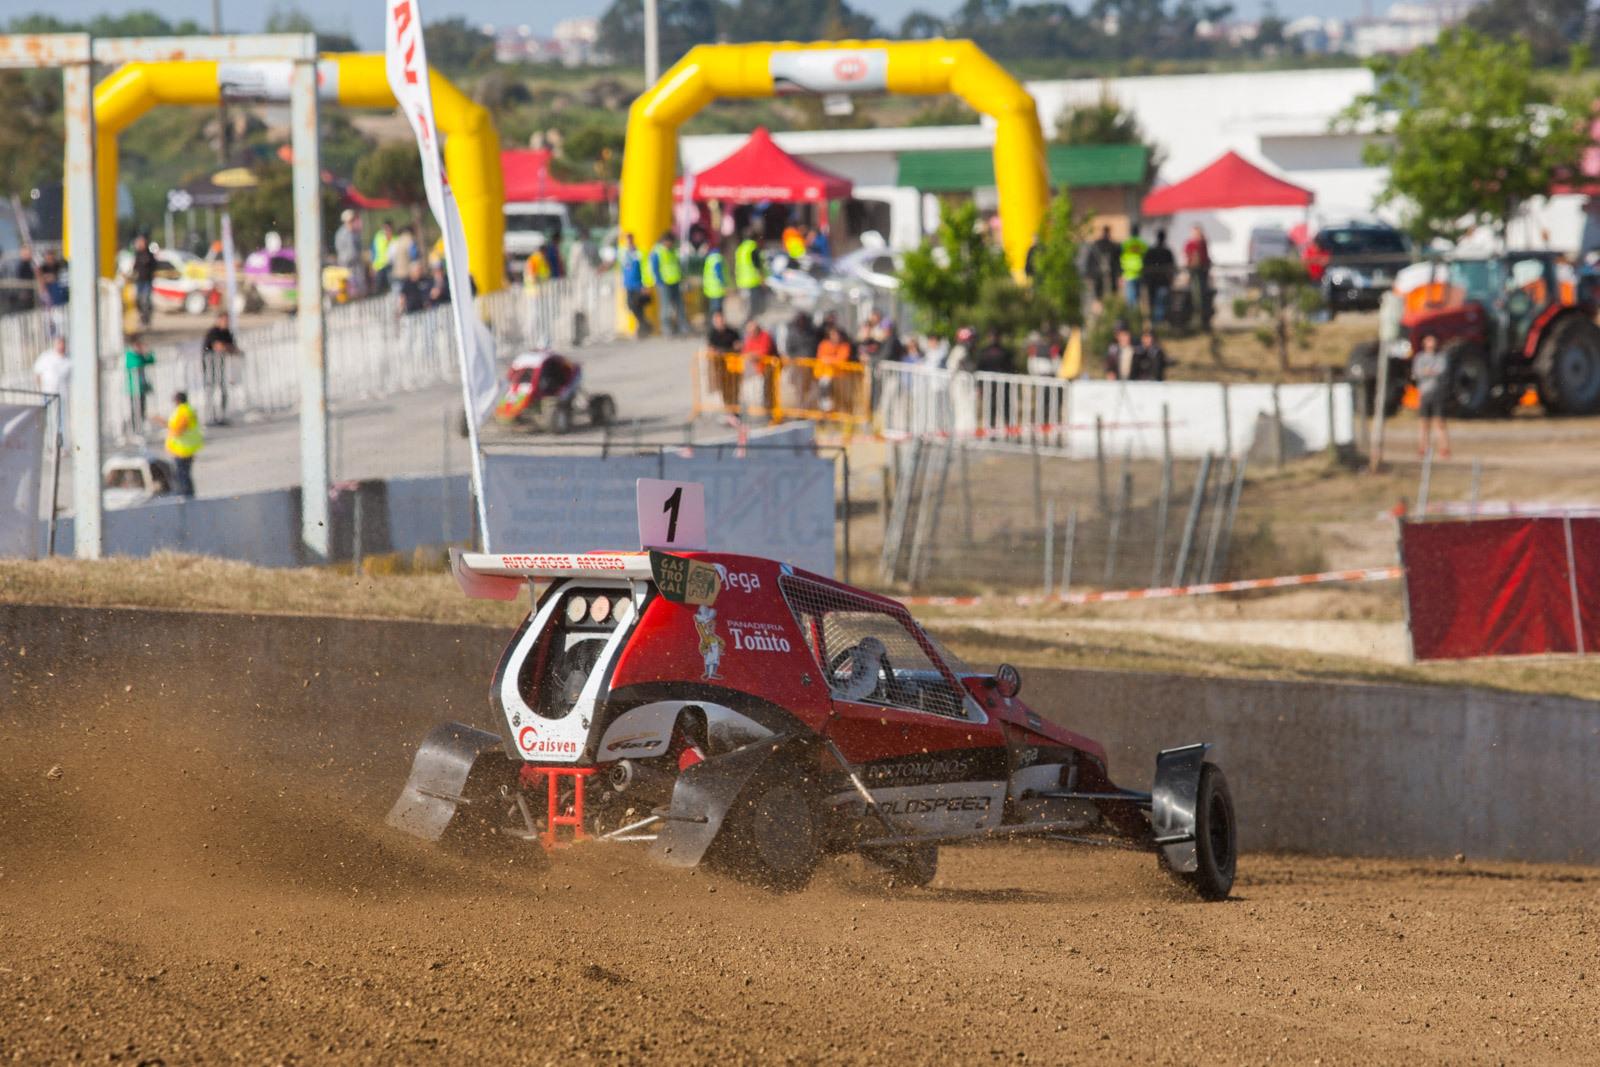 004 Autocross Castelo Branco 2016 011